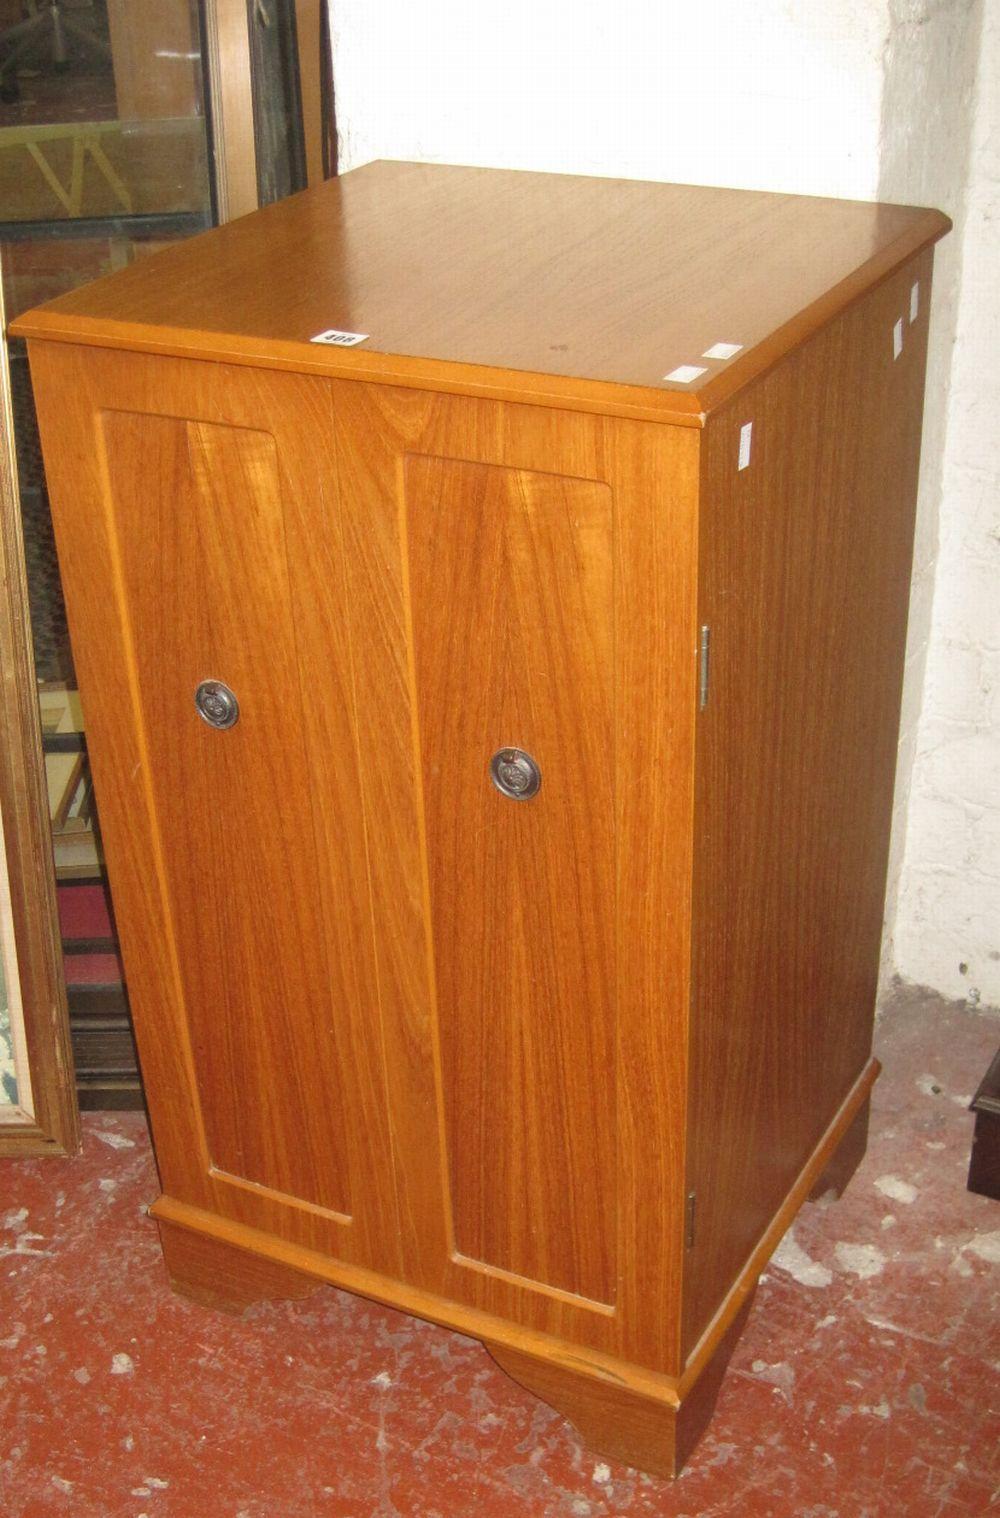 A modern hardwood cabinet